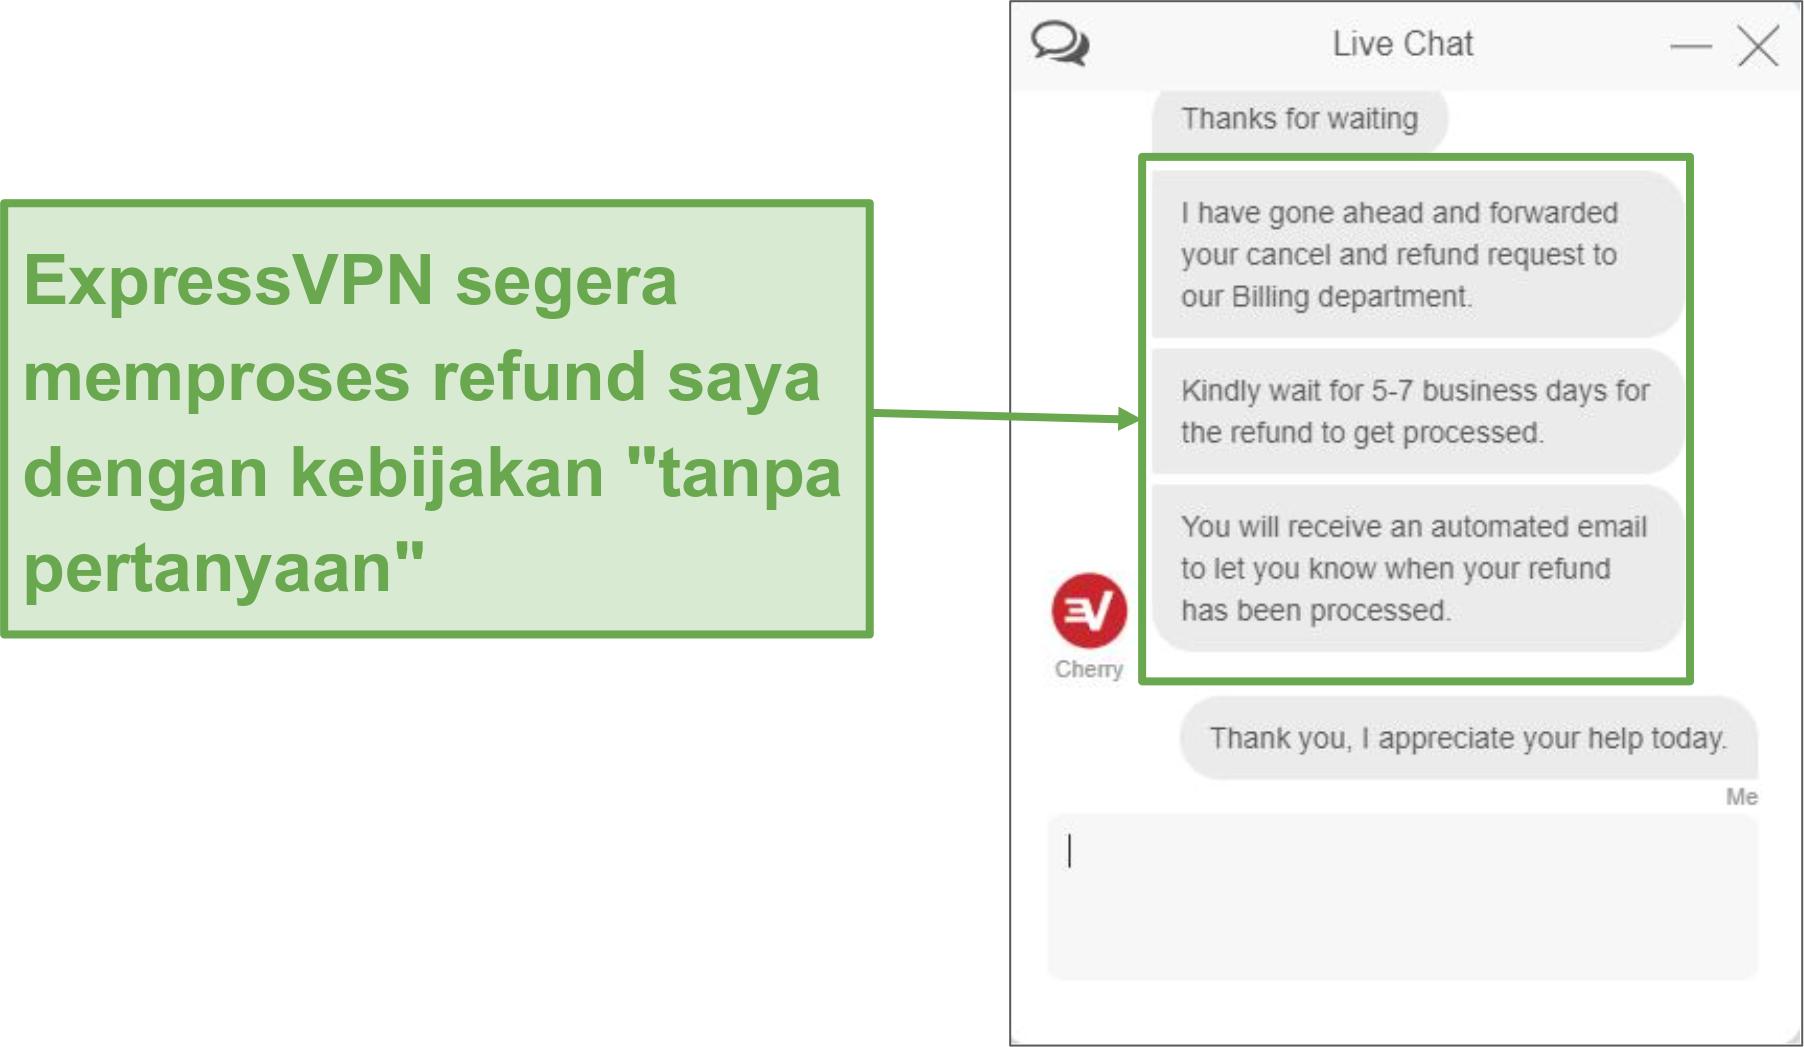 Tangkapan layar obrolan pengembalian dana penuh ExpressVPN